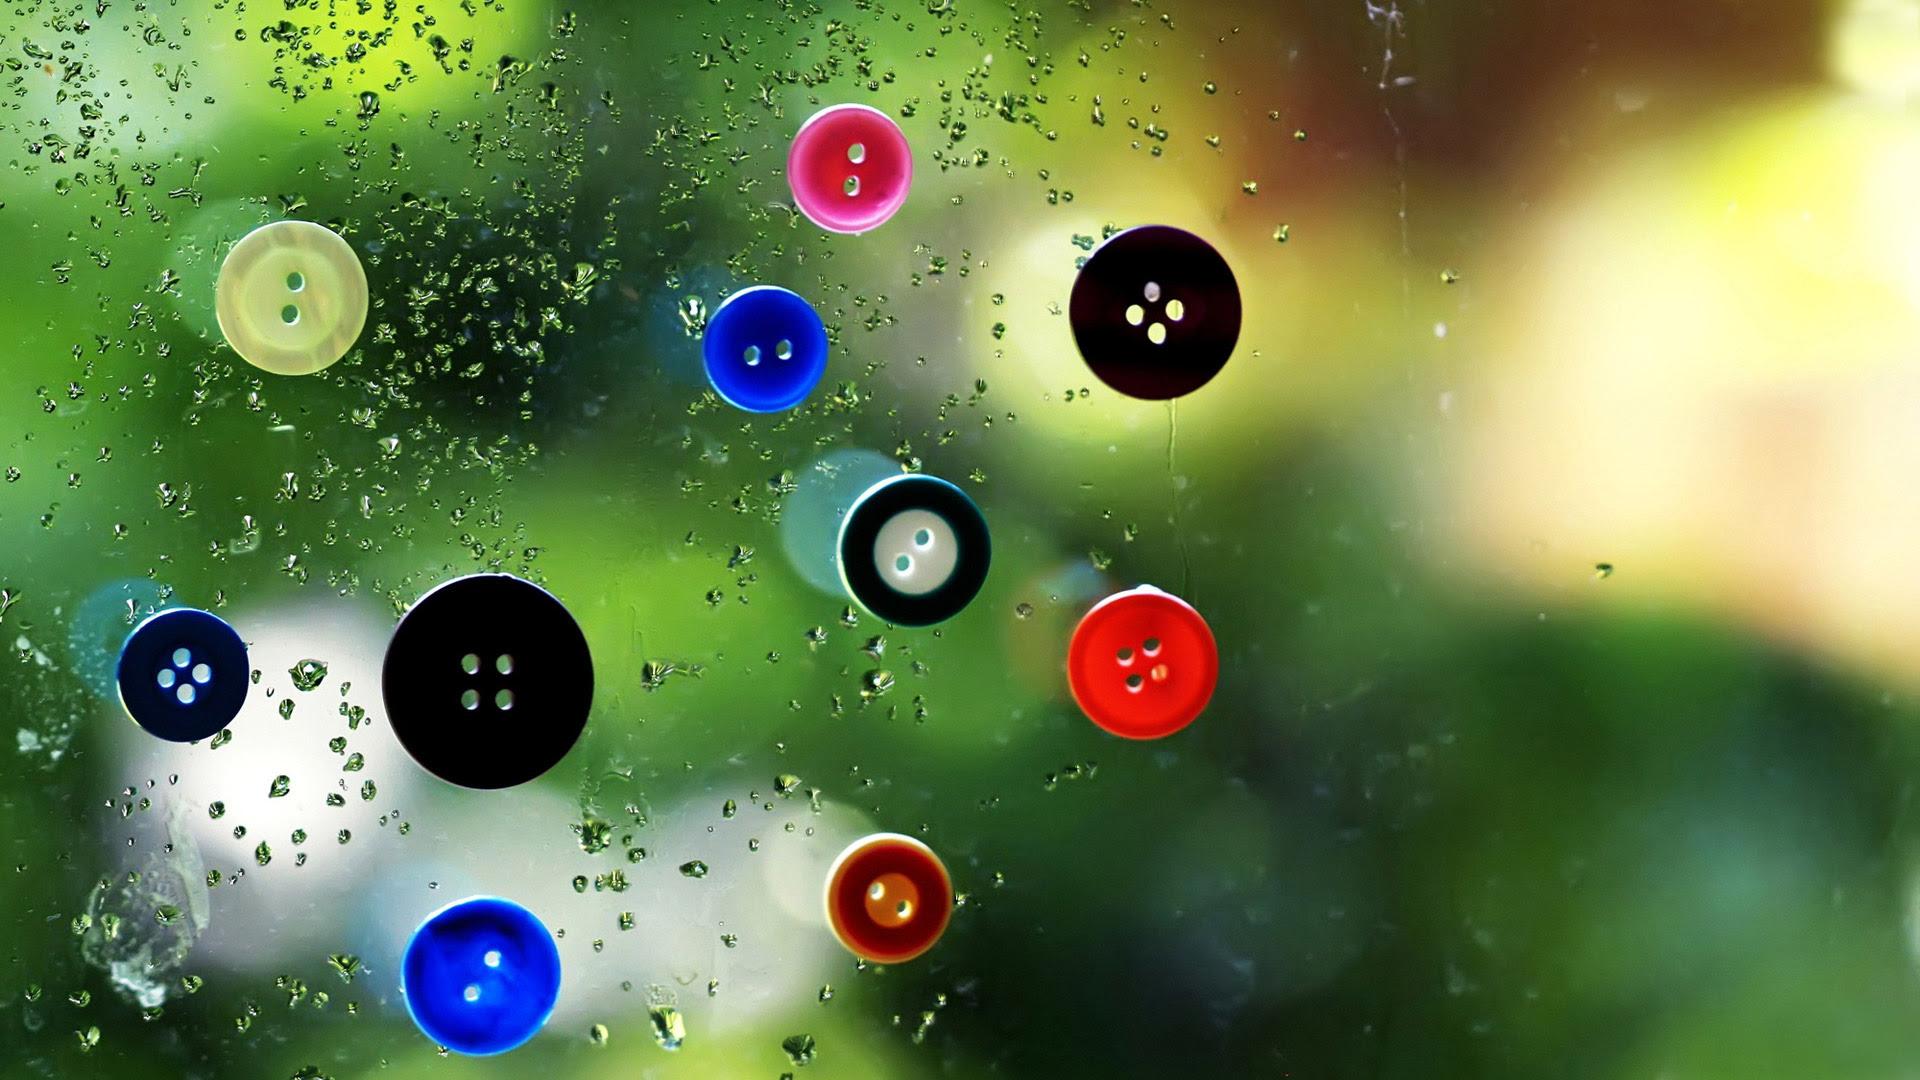 Colorful button wallpaper [1920x1080]